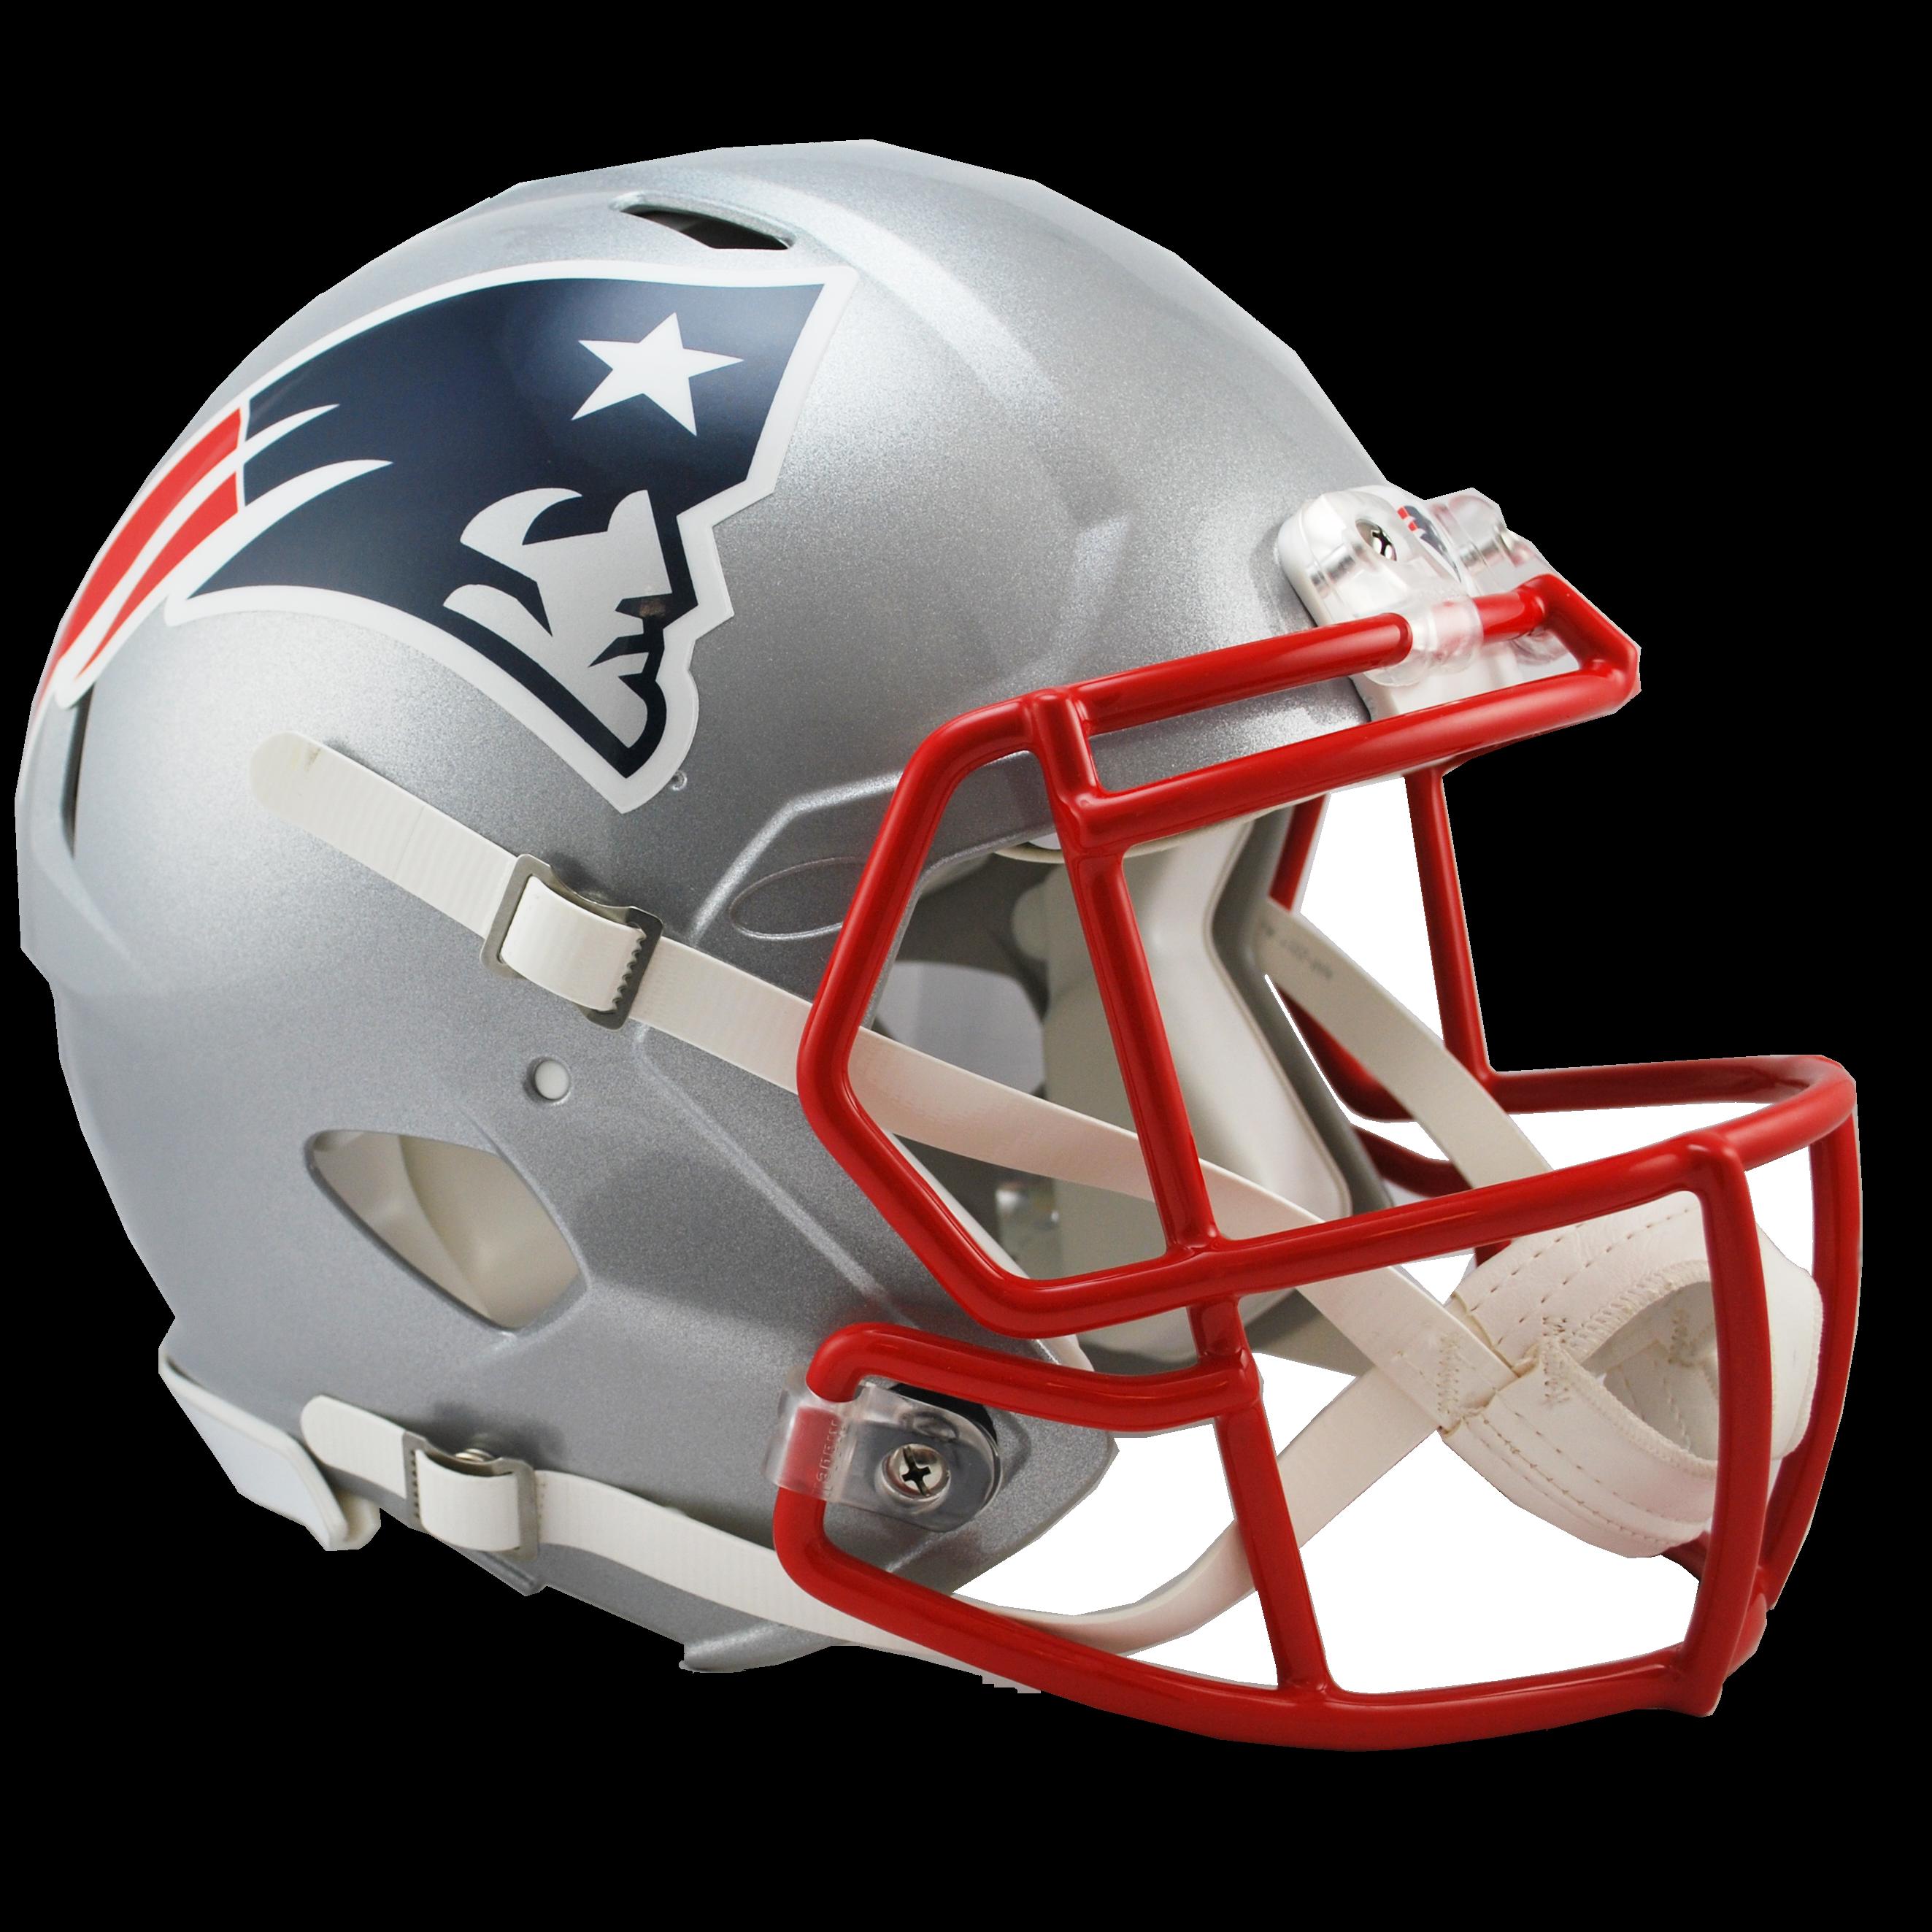 New England Patriots Revolution Speed Authentic Helmet Football Helmets New England Patriots Helmet Nfl New England Patriots